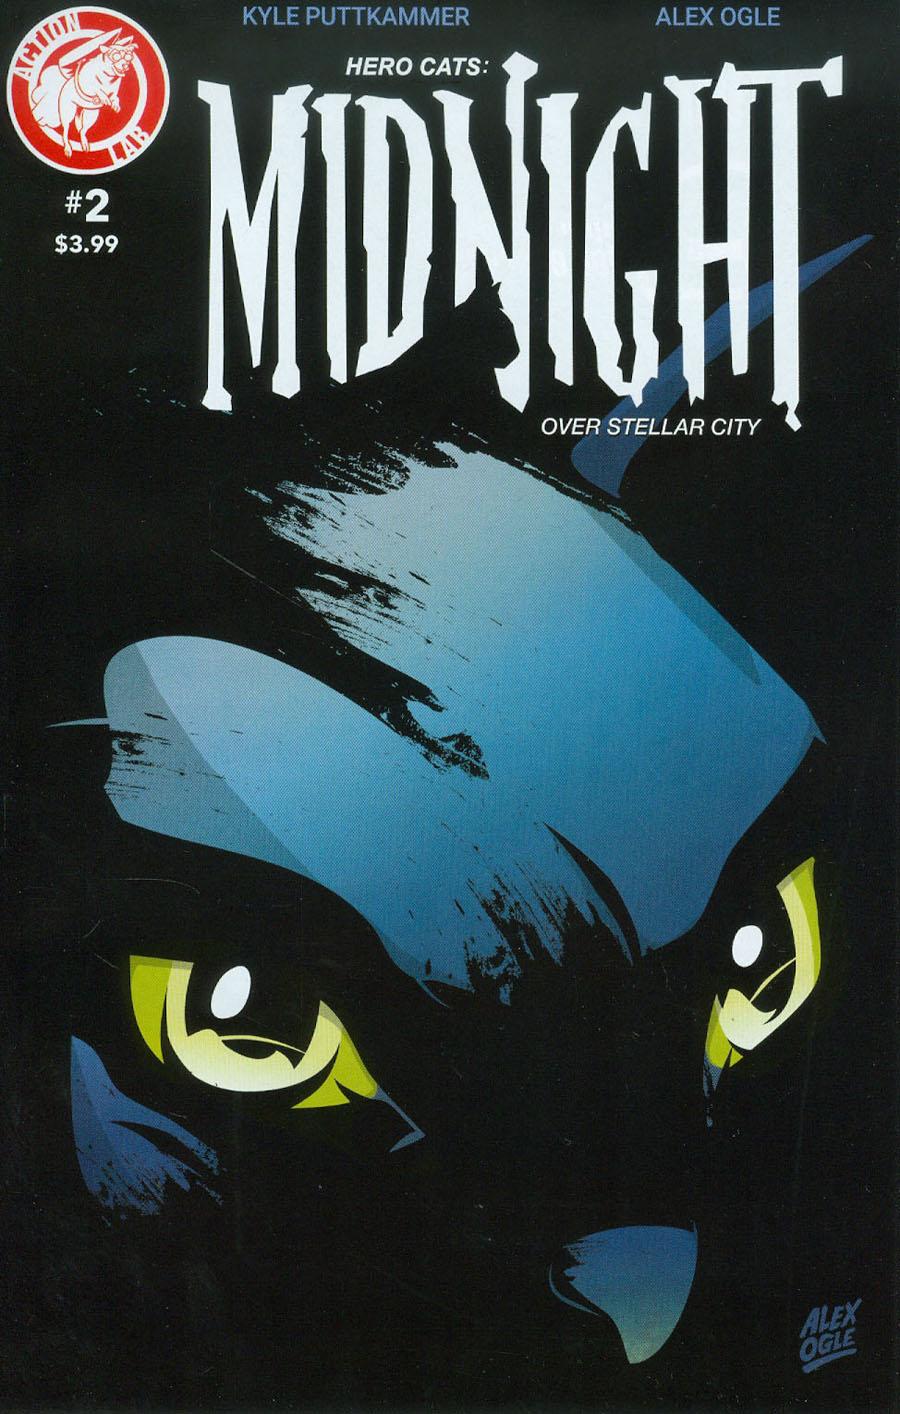 Hero Cats Midnight Over Stellar City #2